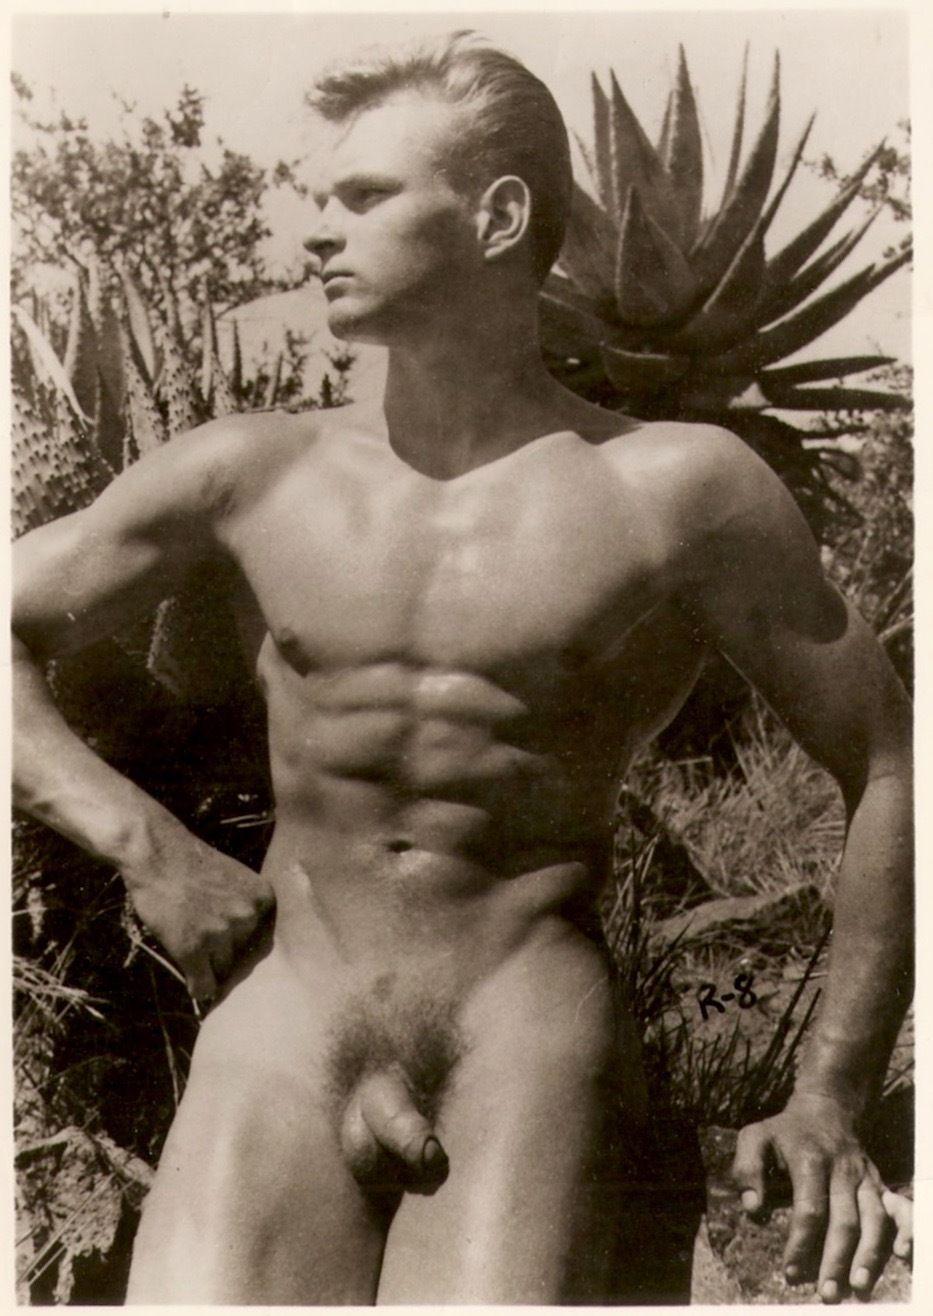 Vintage Male Photo 16